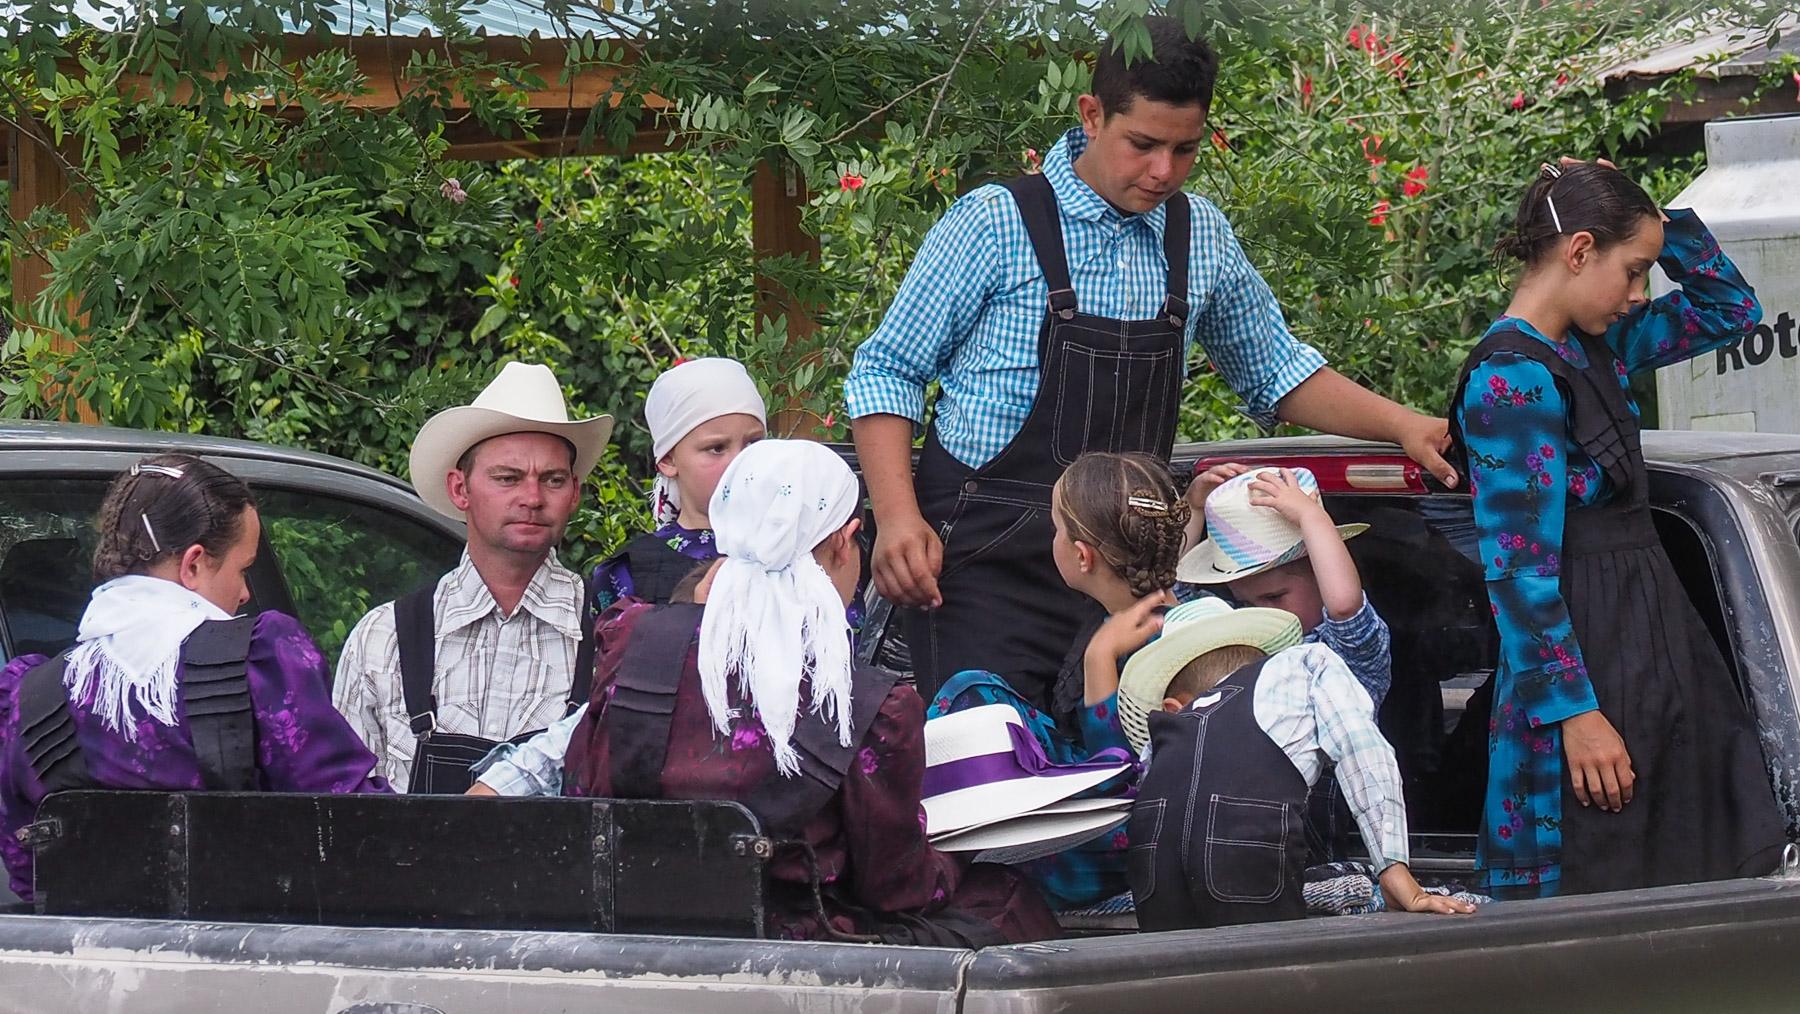 Es gibt große Mennonitengruppen in Belize